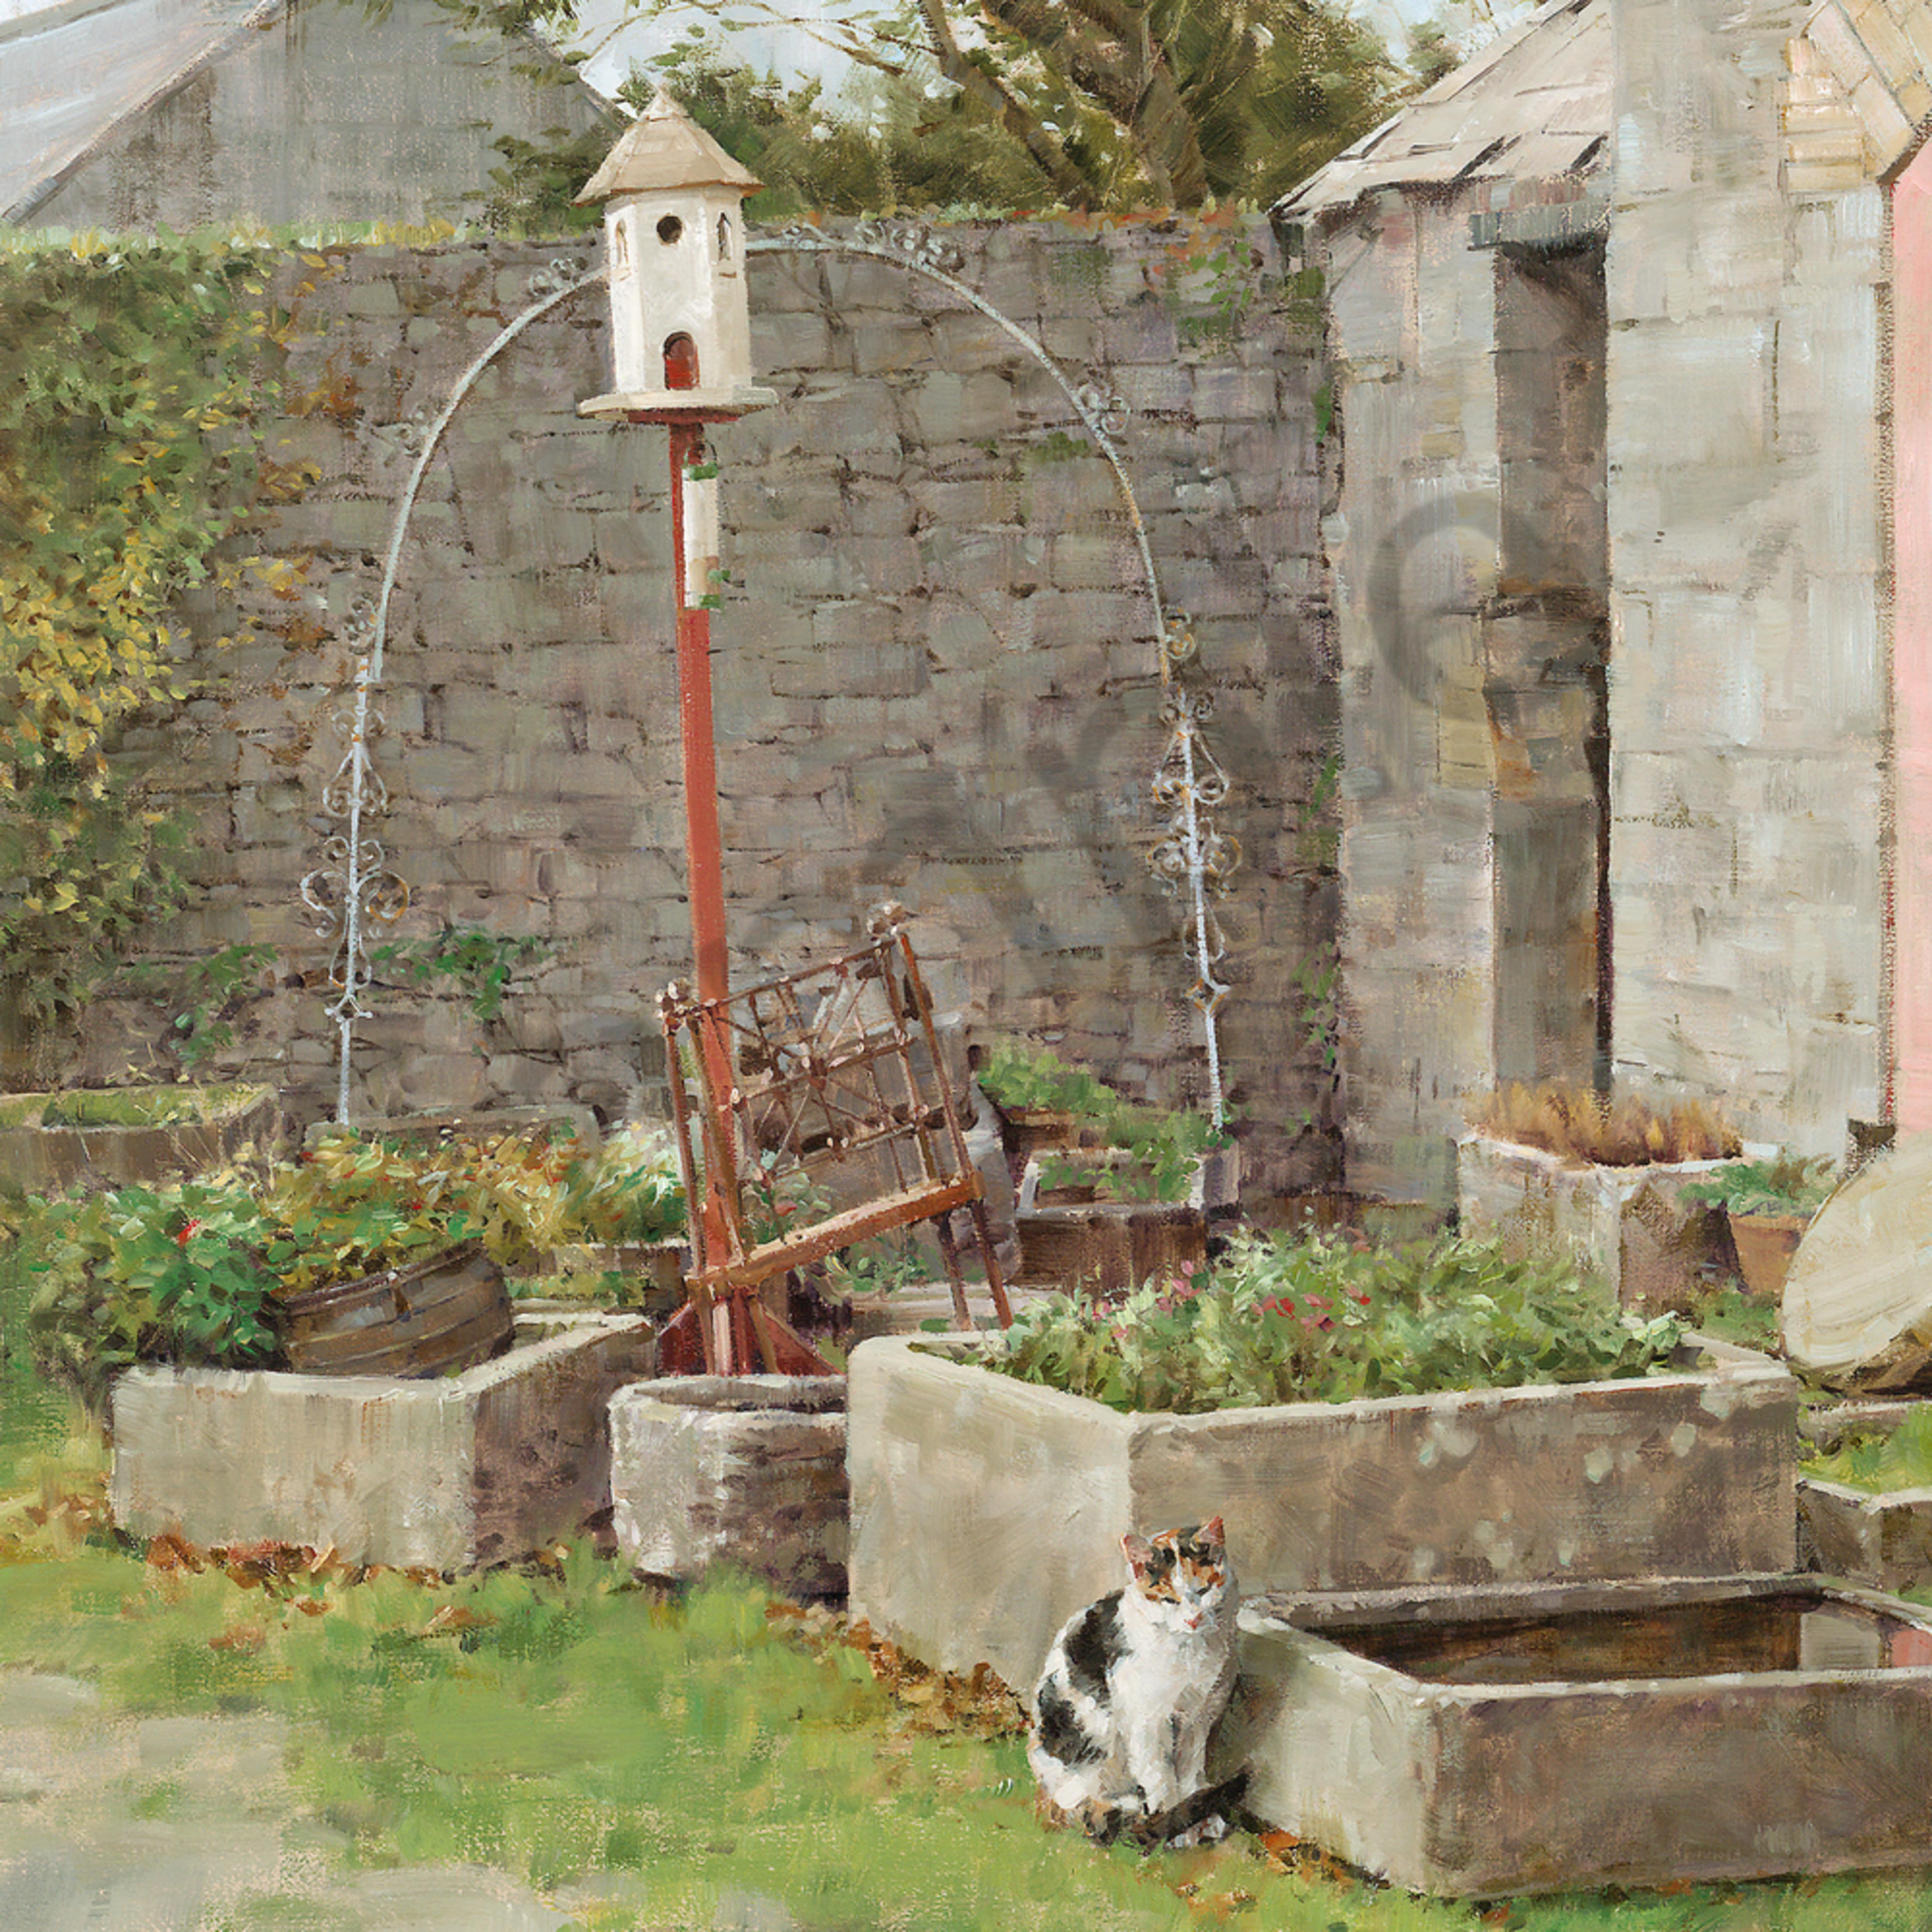 Courtyard kitty copy dpruat